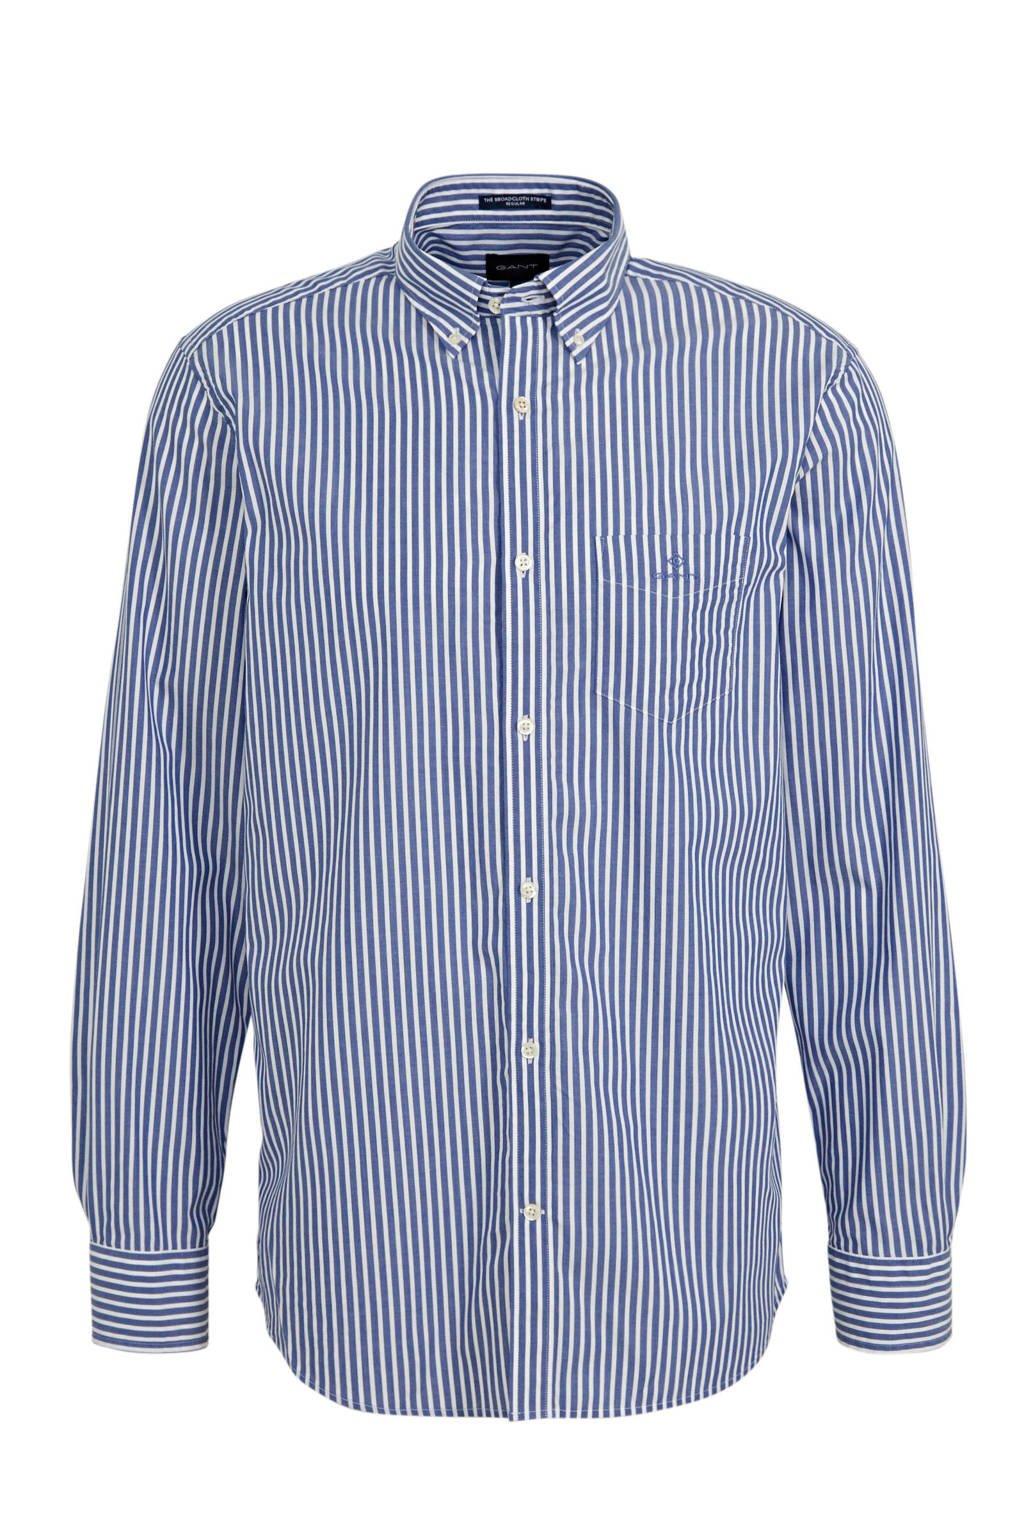 GANT gestreept regular fit overhemd blauw, Blauw